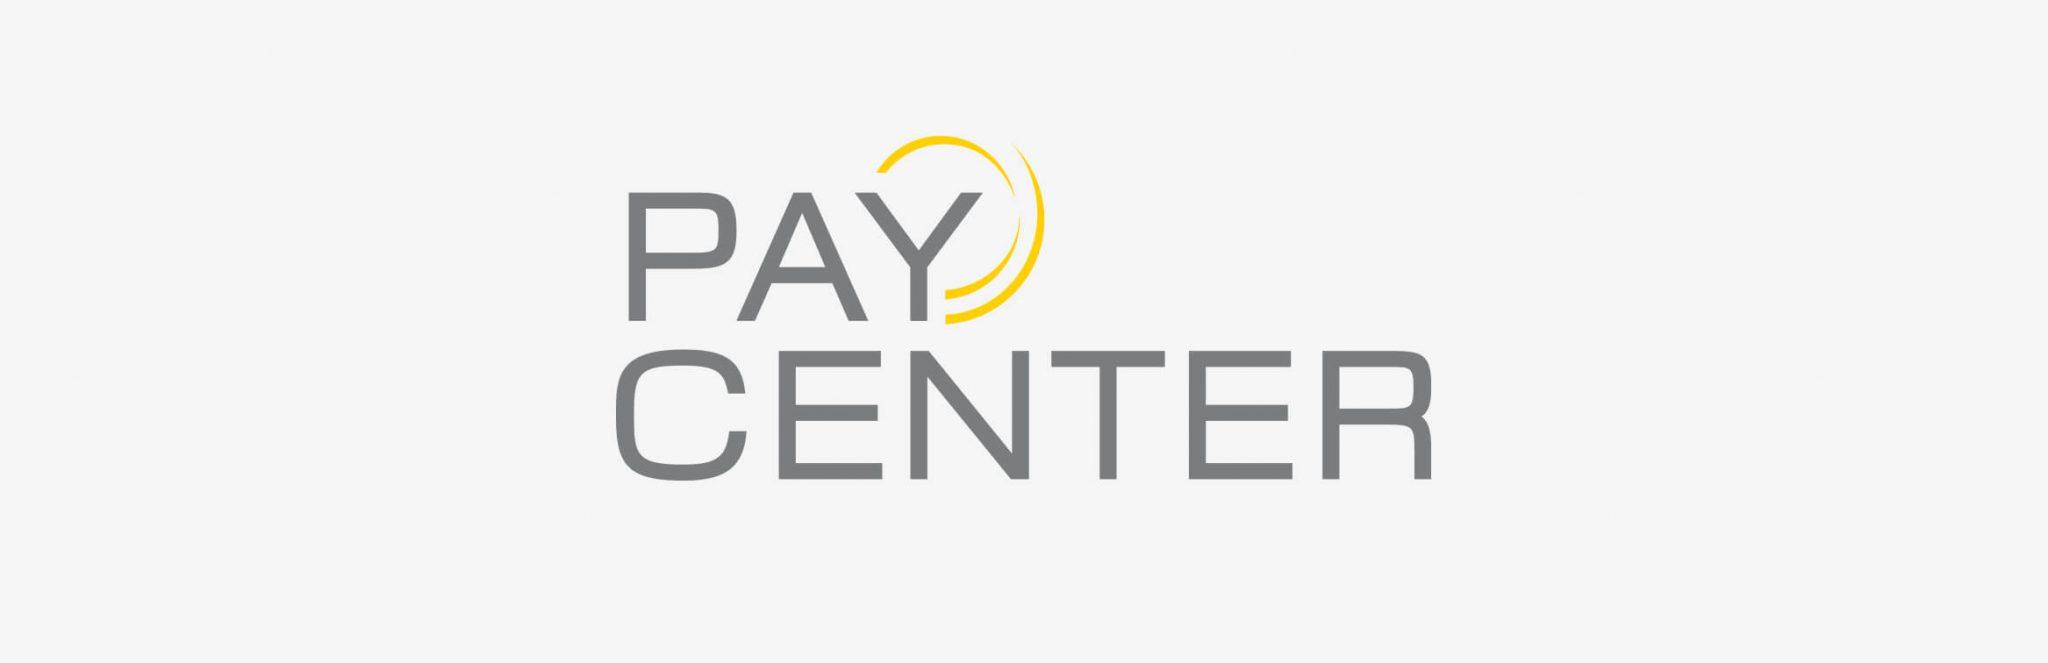 banken_paycenter